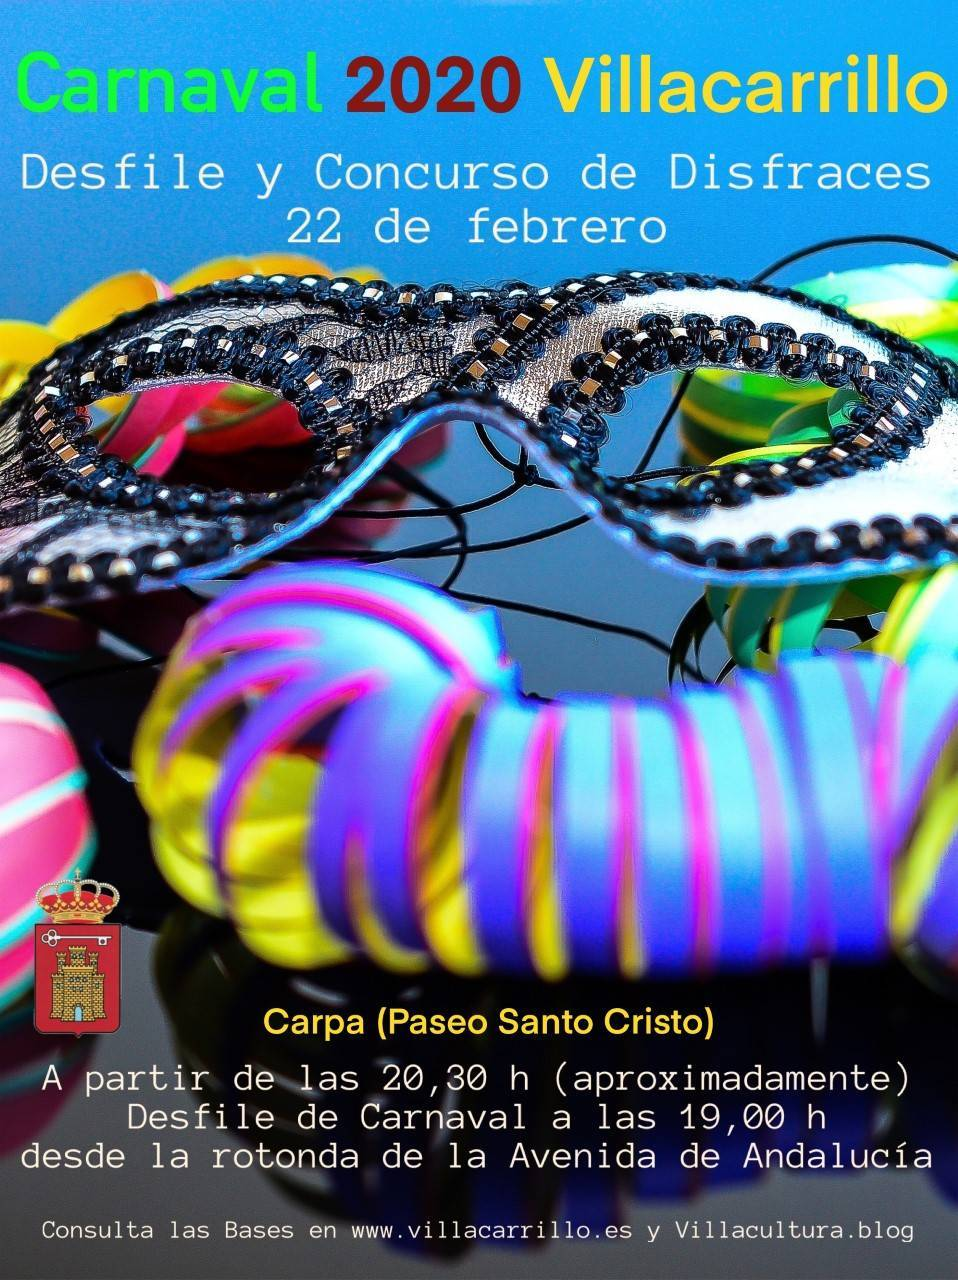 Carnaval 2020 - Villacarrillo (Jaén)